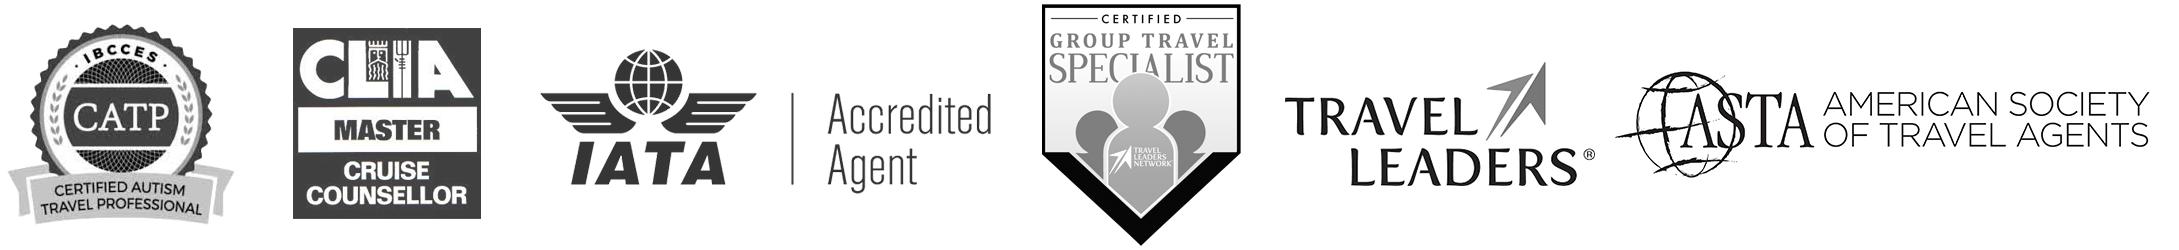 tws-certifications-new